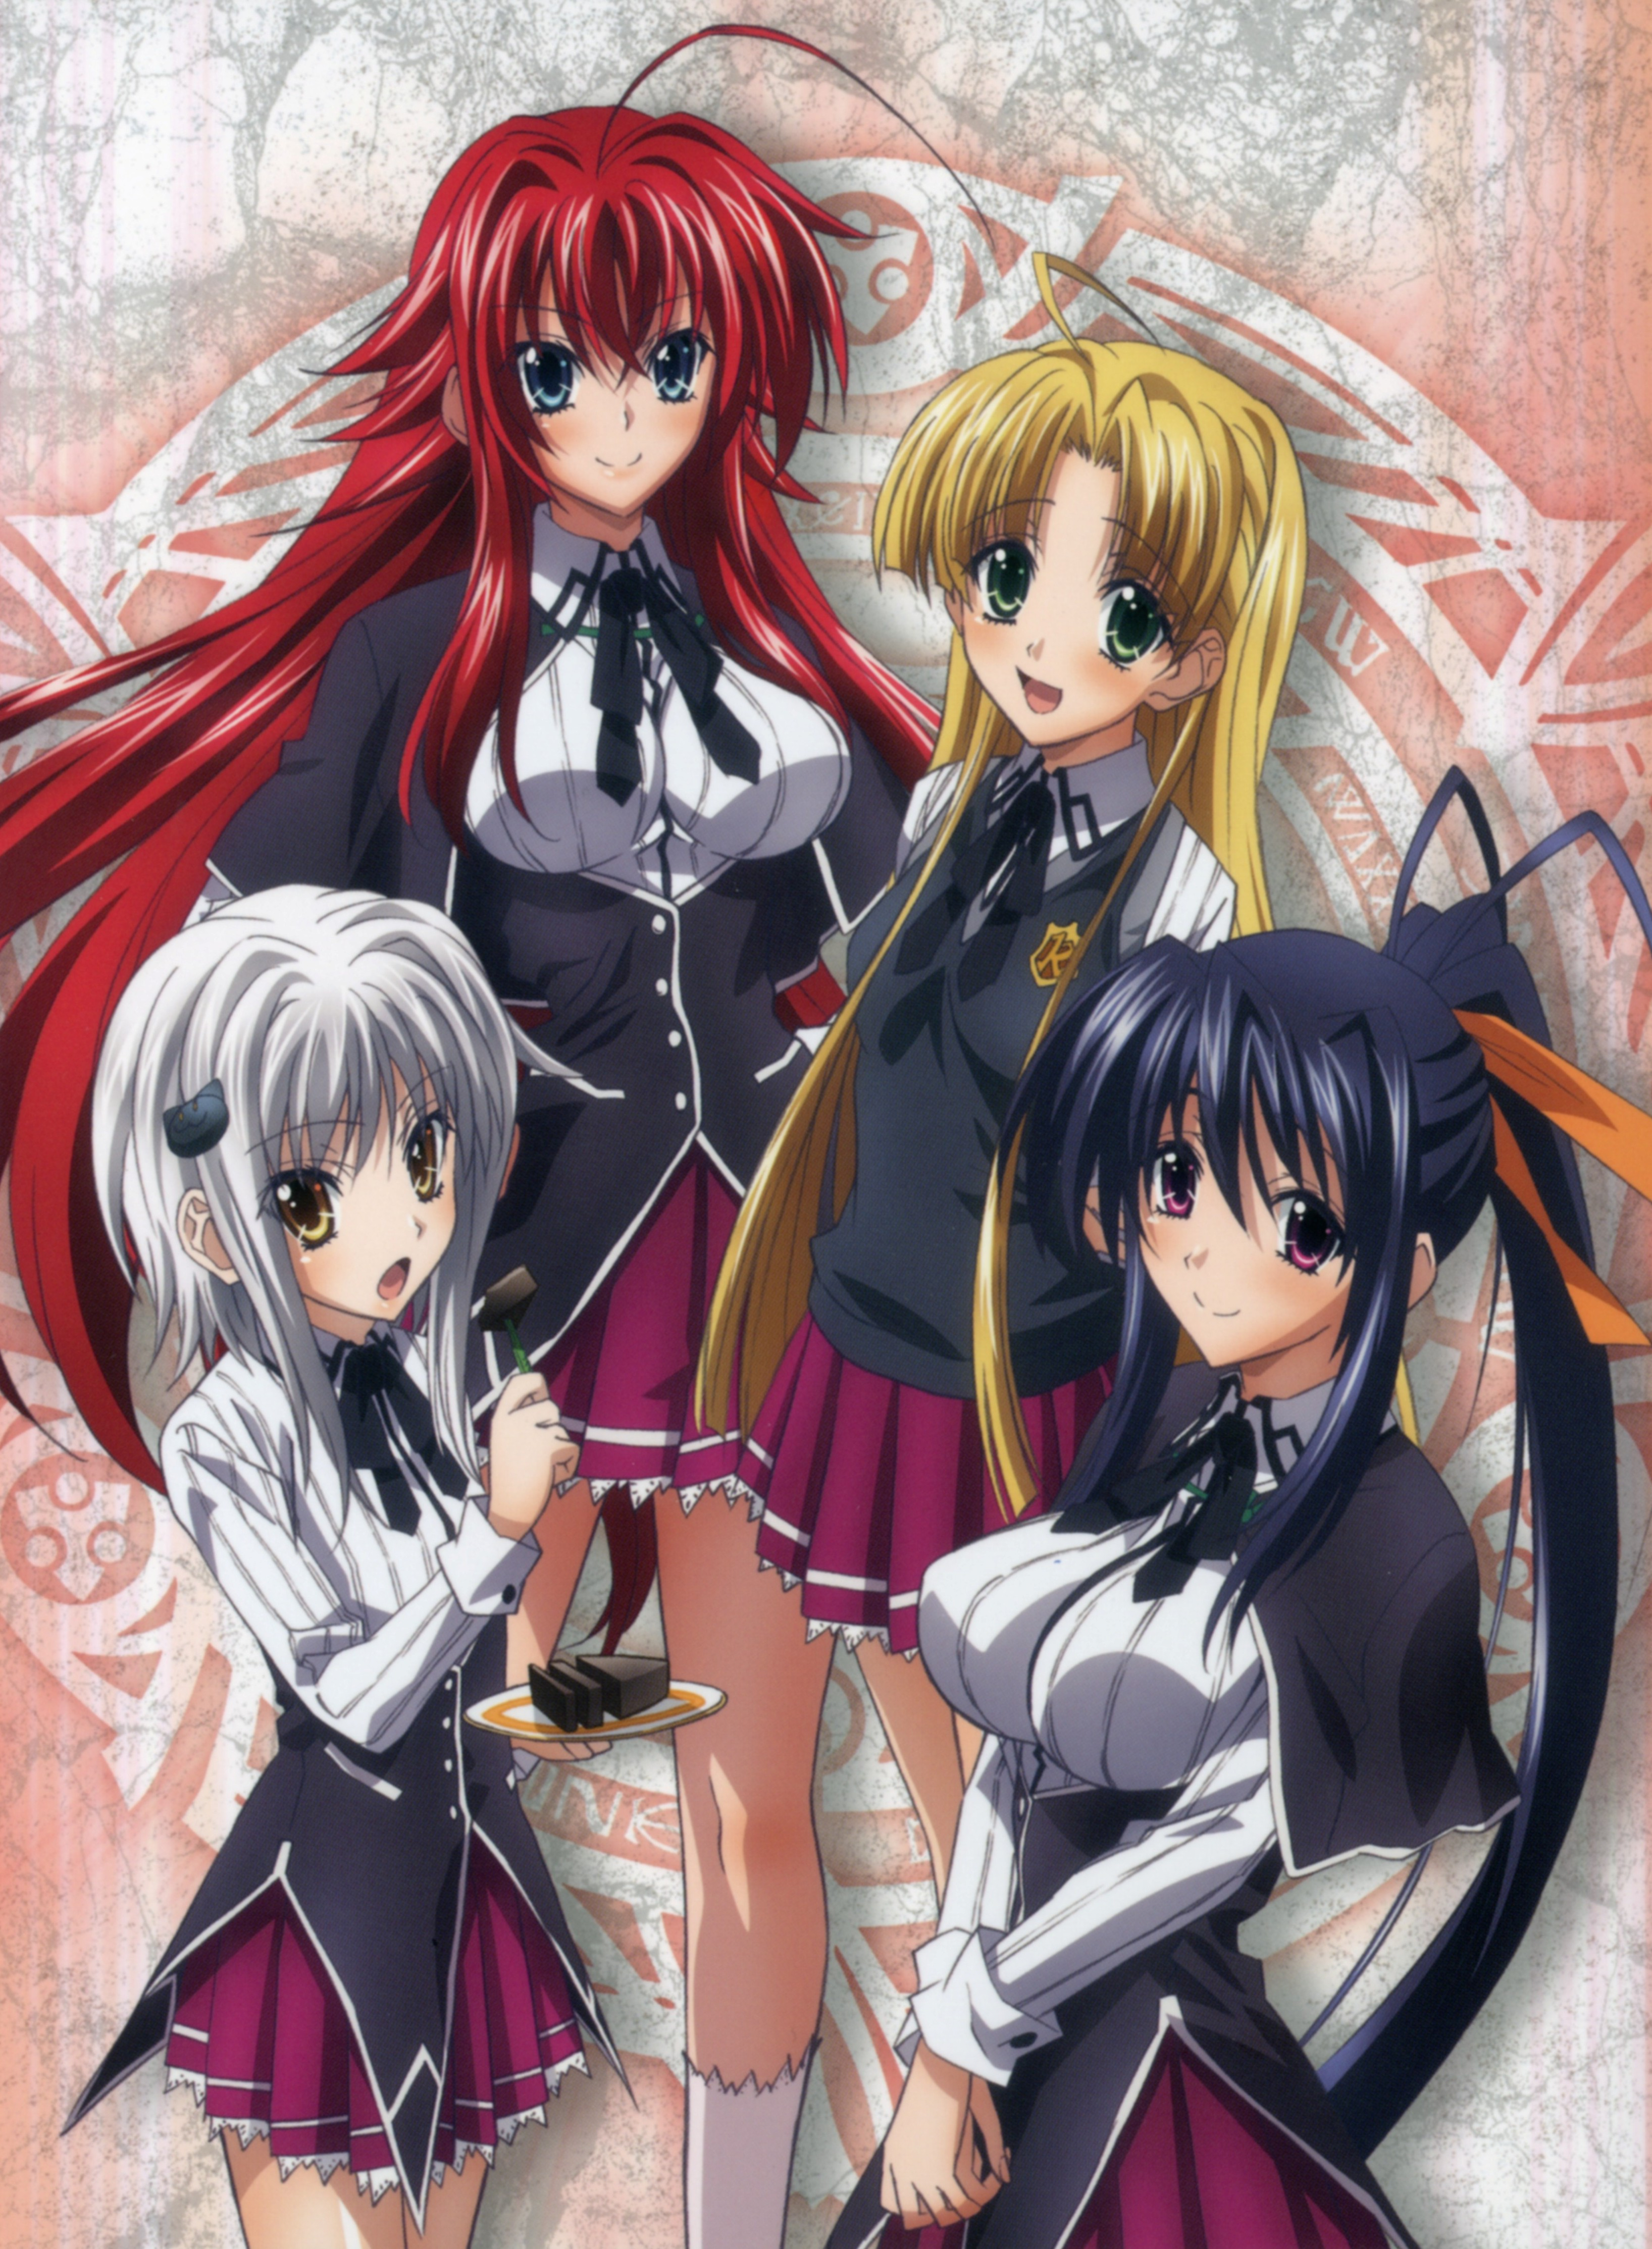 Highschool Dxd Zerochan Anime Image Board